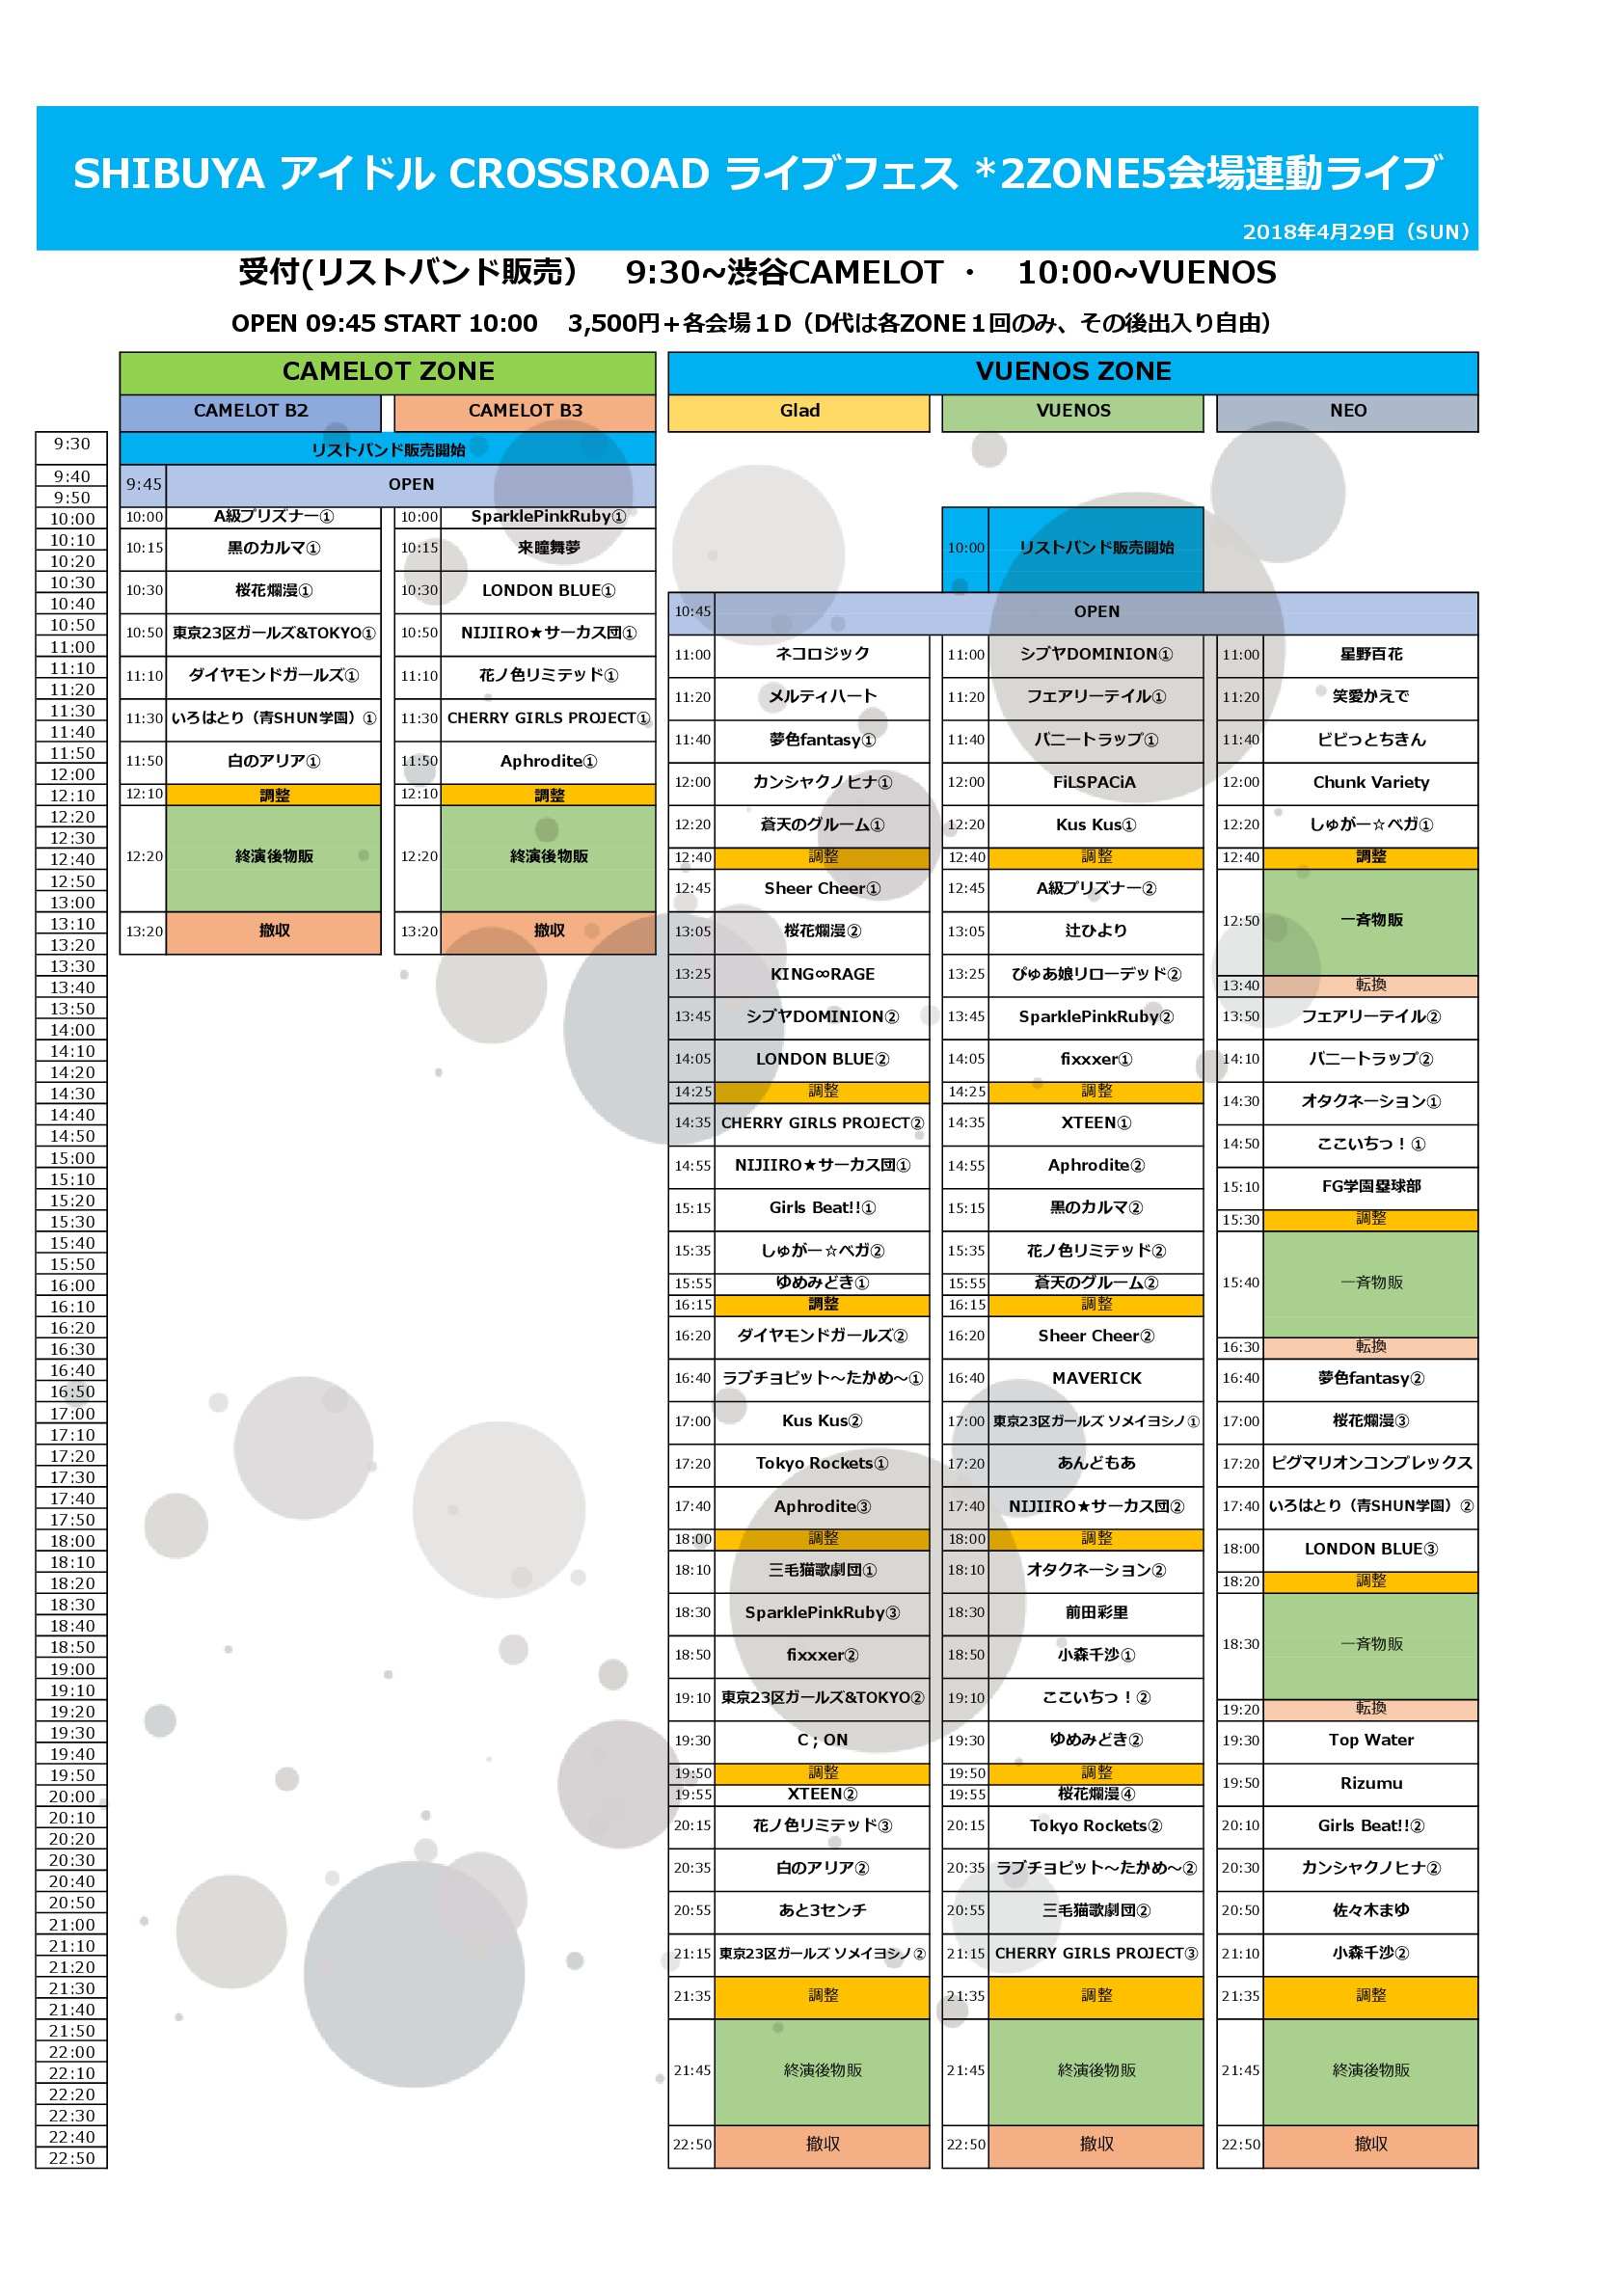 SHIBUYAアイドルCROSSROAD ライブフェス